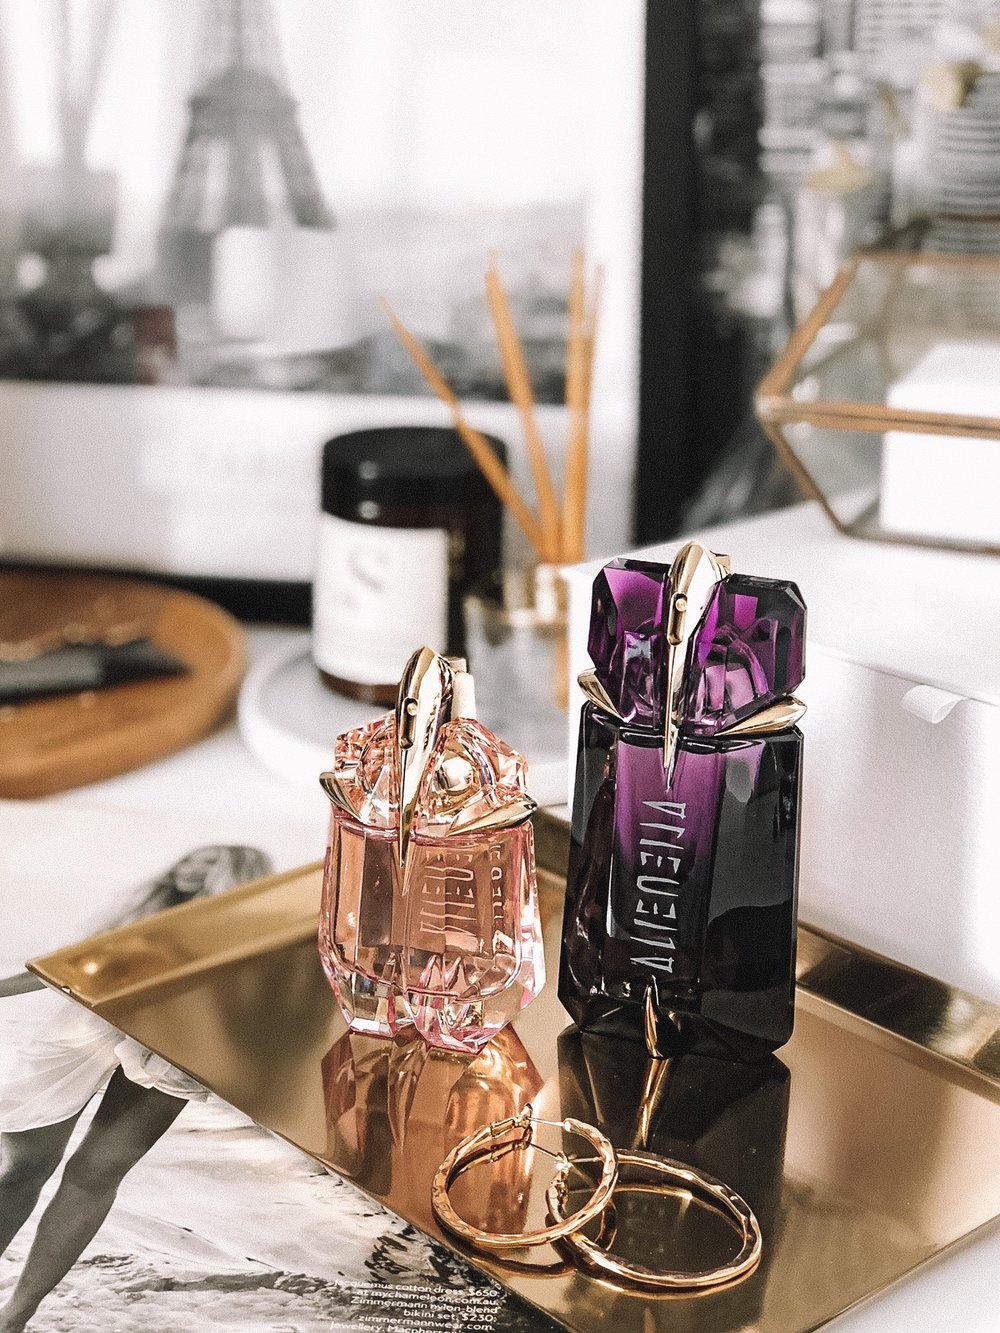 Mugler Alien FLora Futura Fragrance Review